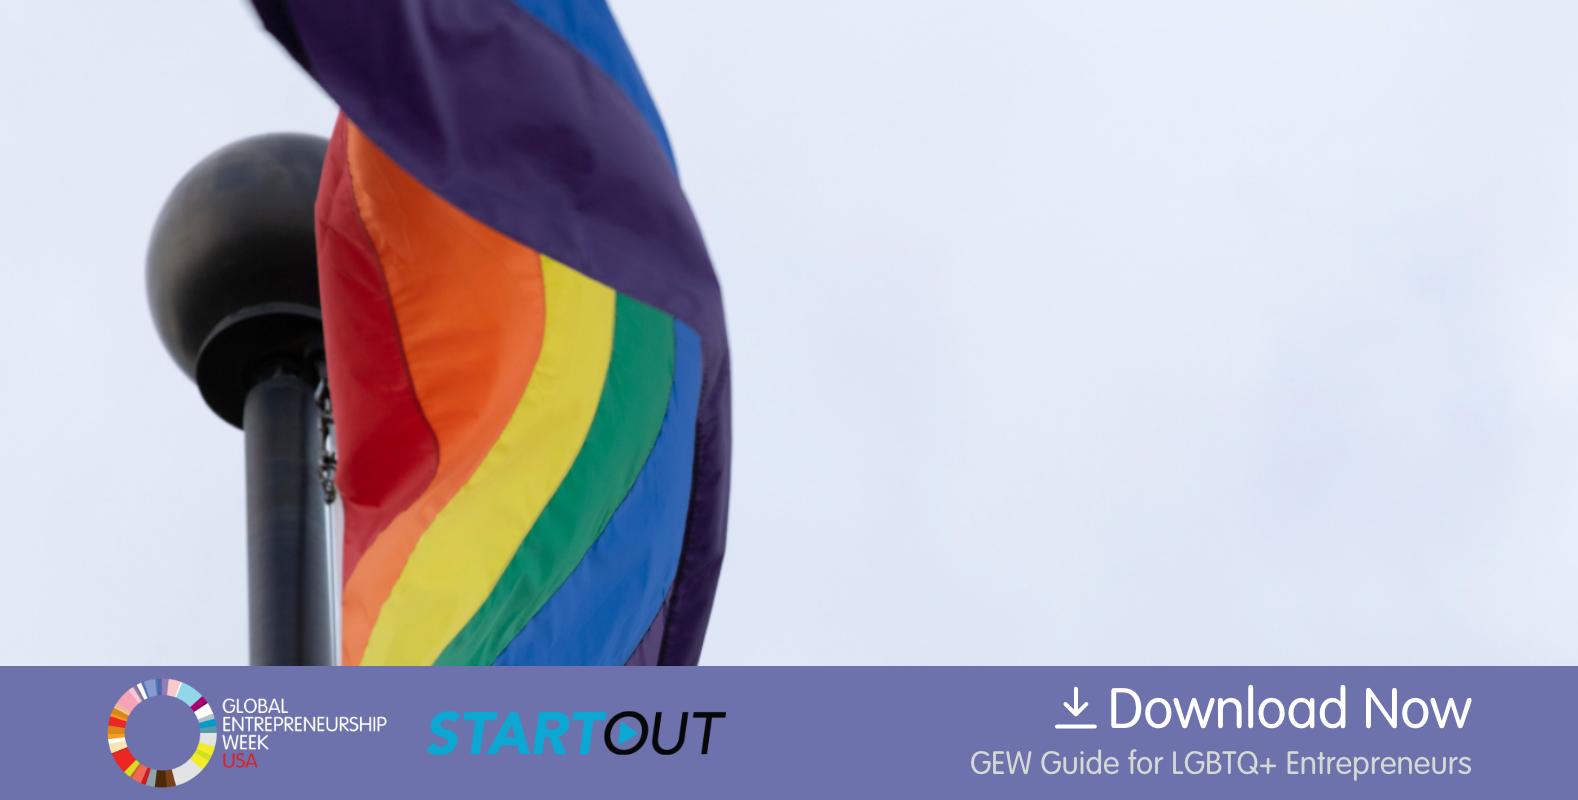 GEW Guide for LGBTQ+ Entrepreneurs